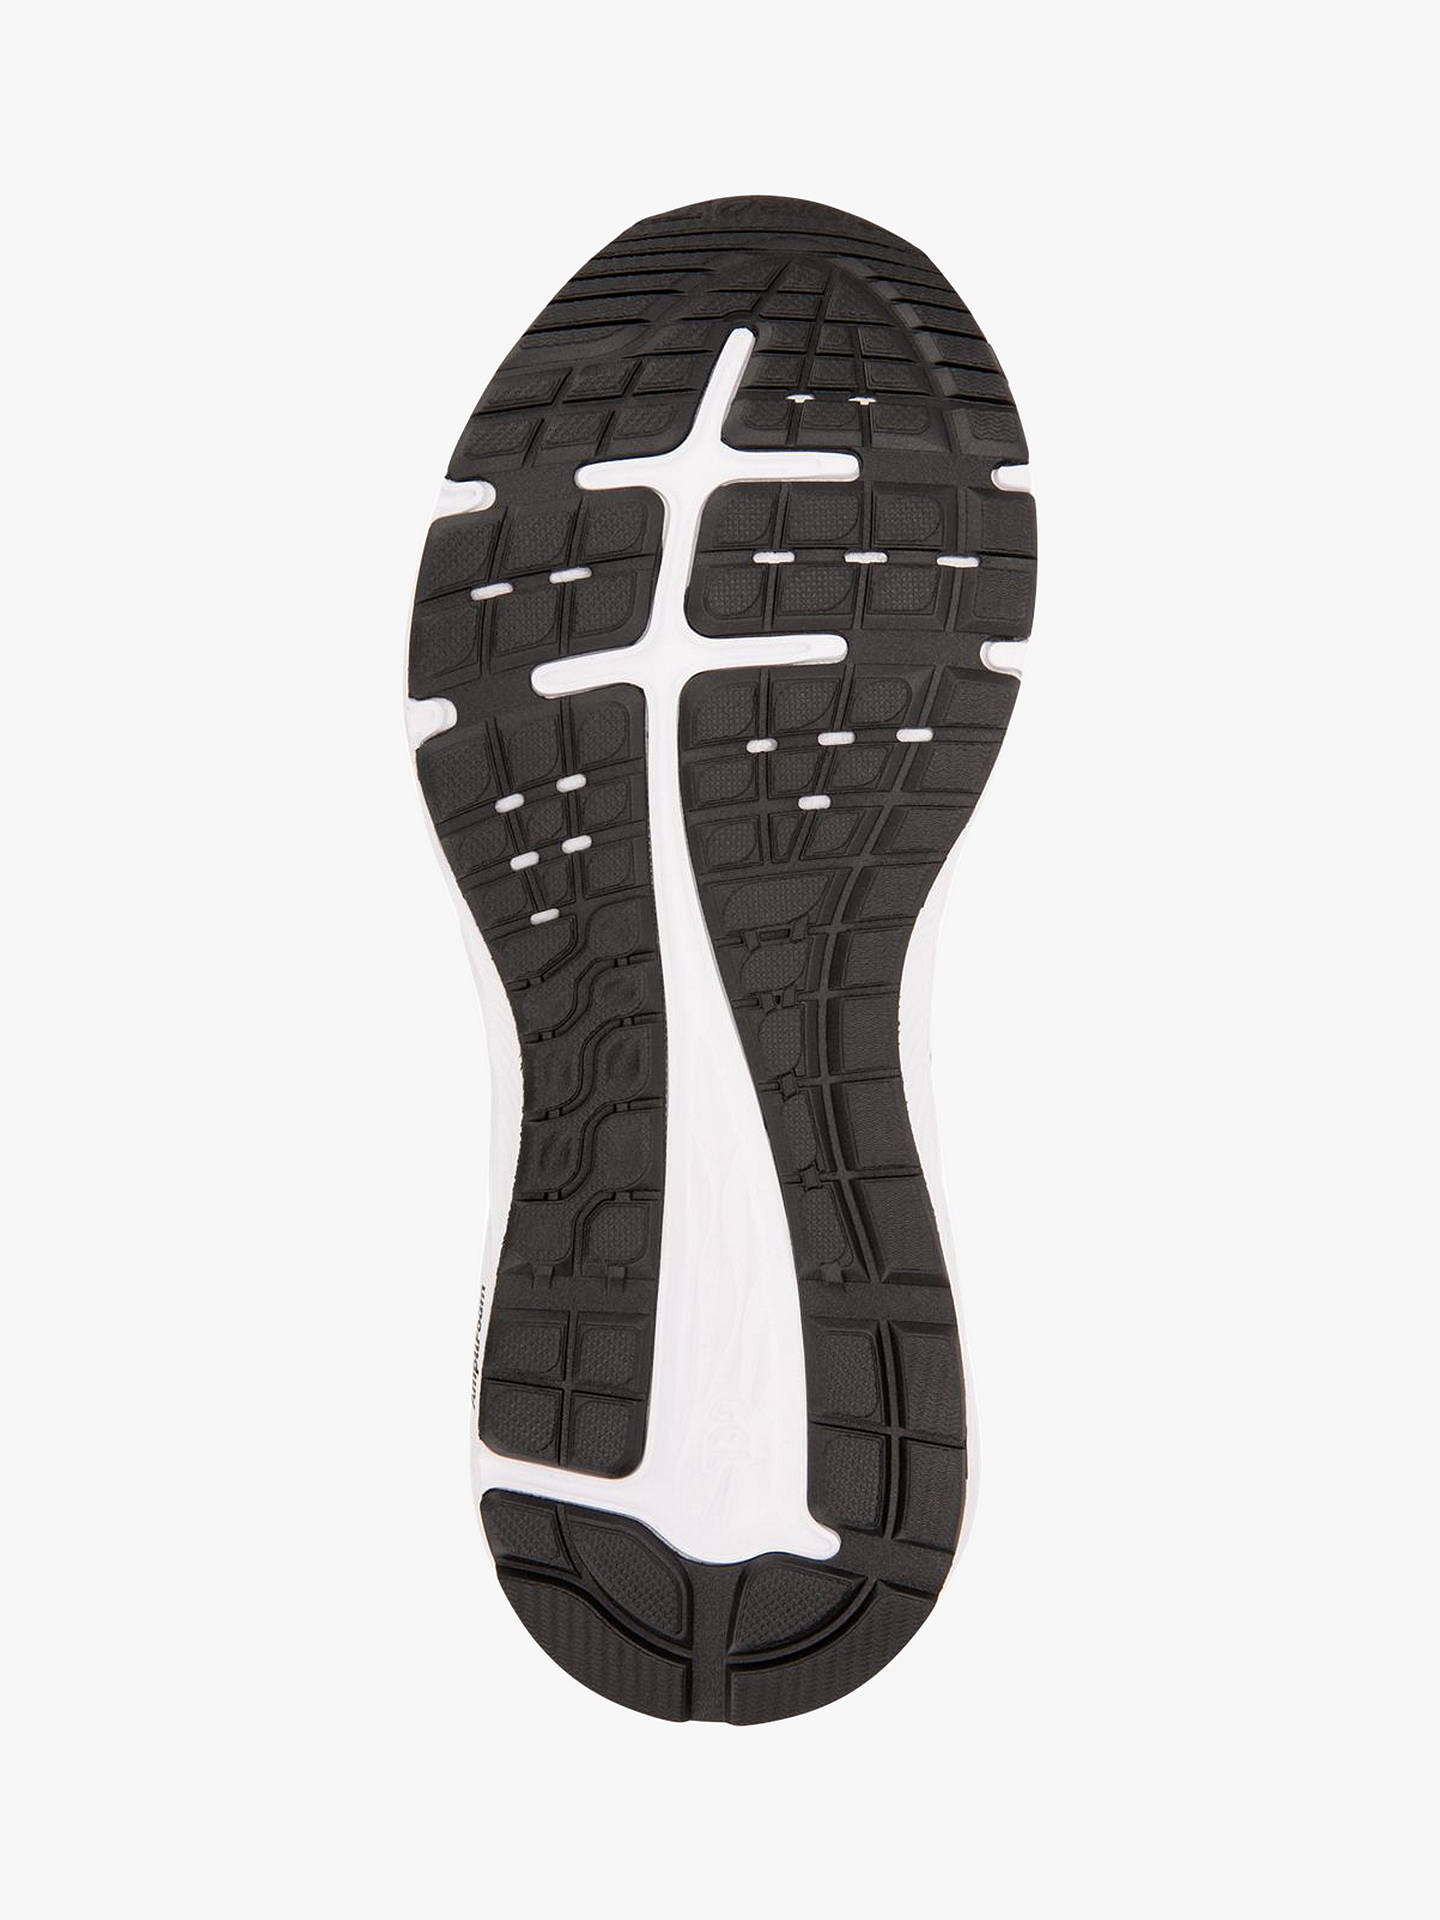 9d1170c3b71 ASICS GEL-EXCITE 6 Women s Running Shoes at John Lewis   Partners